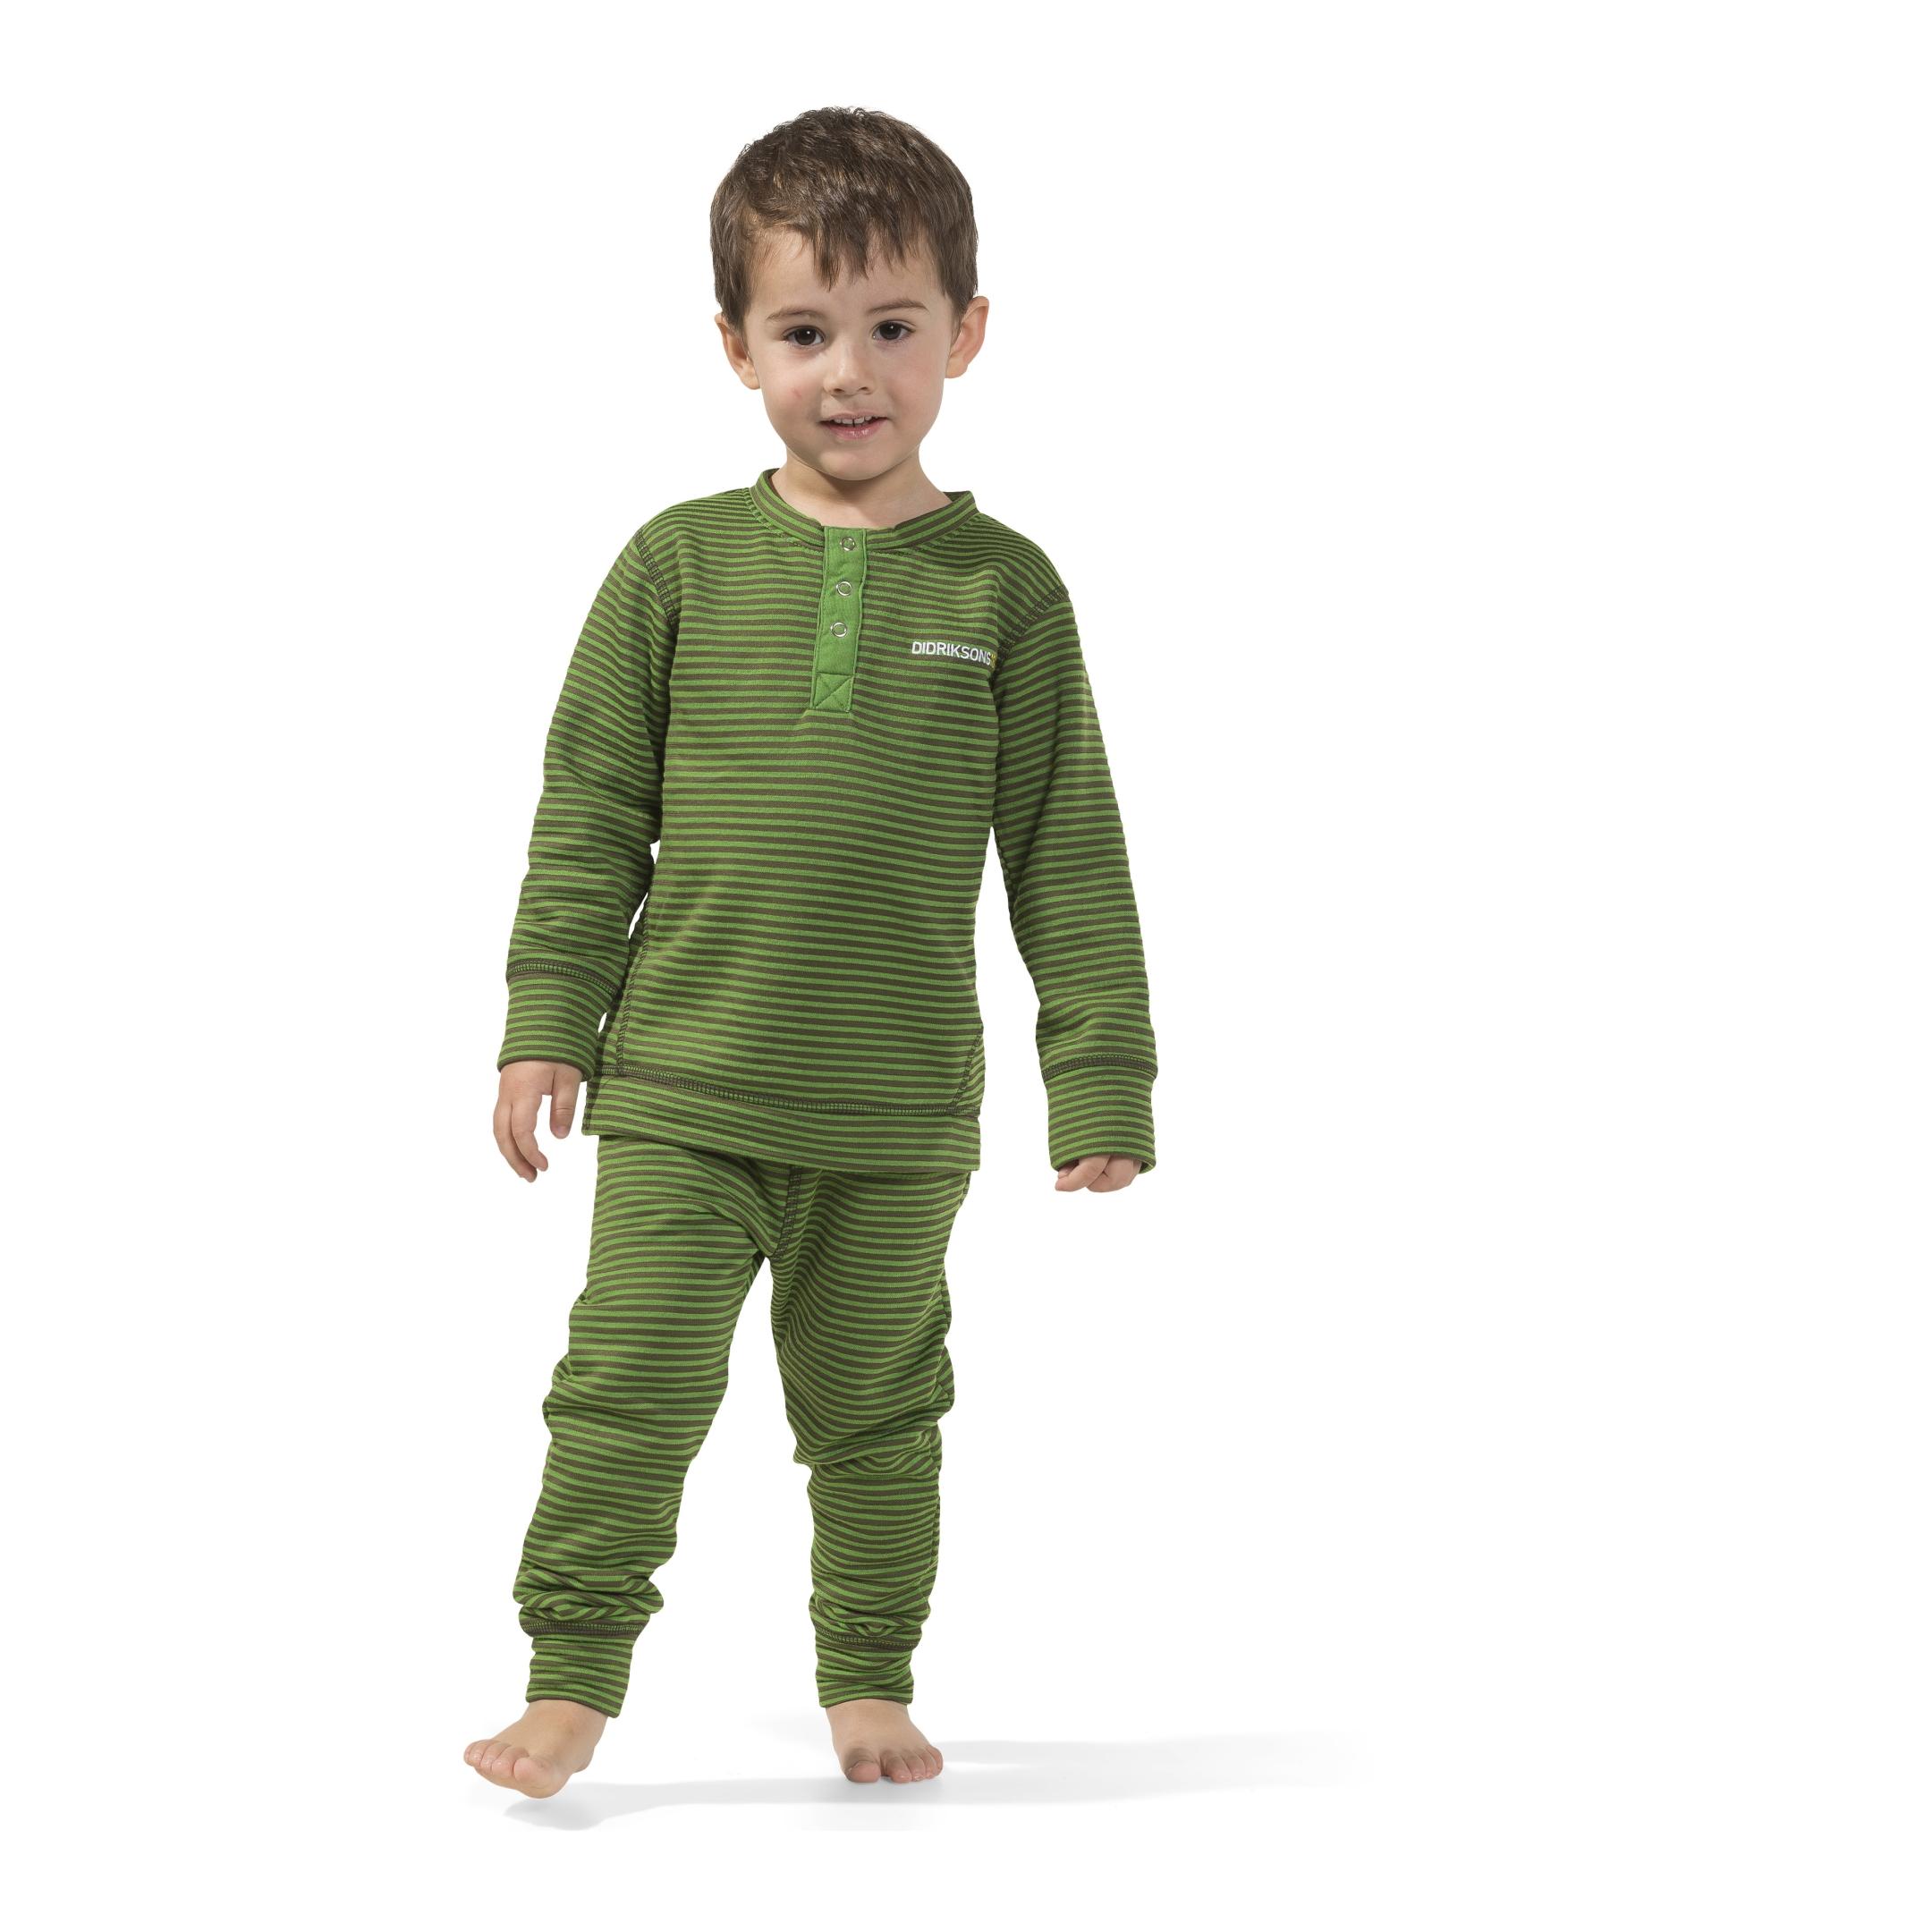 alt-detske-funkcne-pradlo-termo-pradlo-pre-deti-oblecenie-pre-chlapcov-funkcny-detsky-komplet-tricko-a-spodky-pre-deti-prva-vrstva-detske-oblecenie_didriksons_moarri_komplet-2